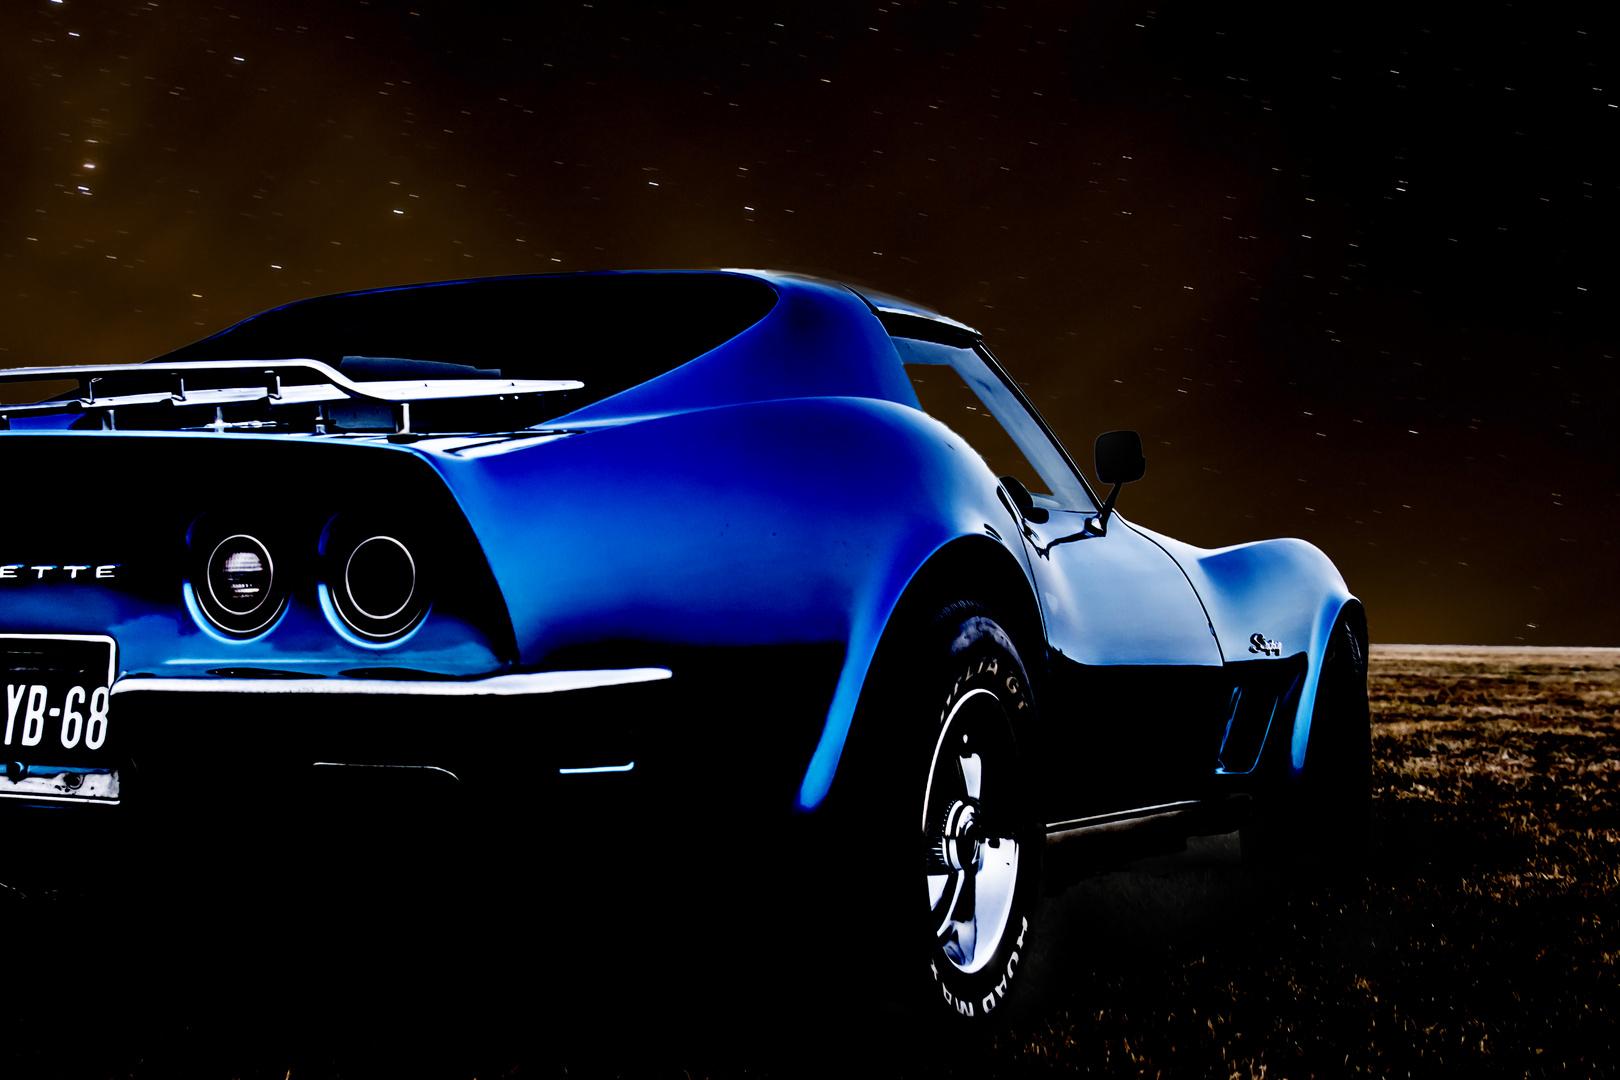 Corvette @ night